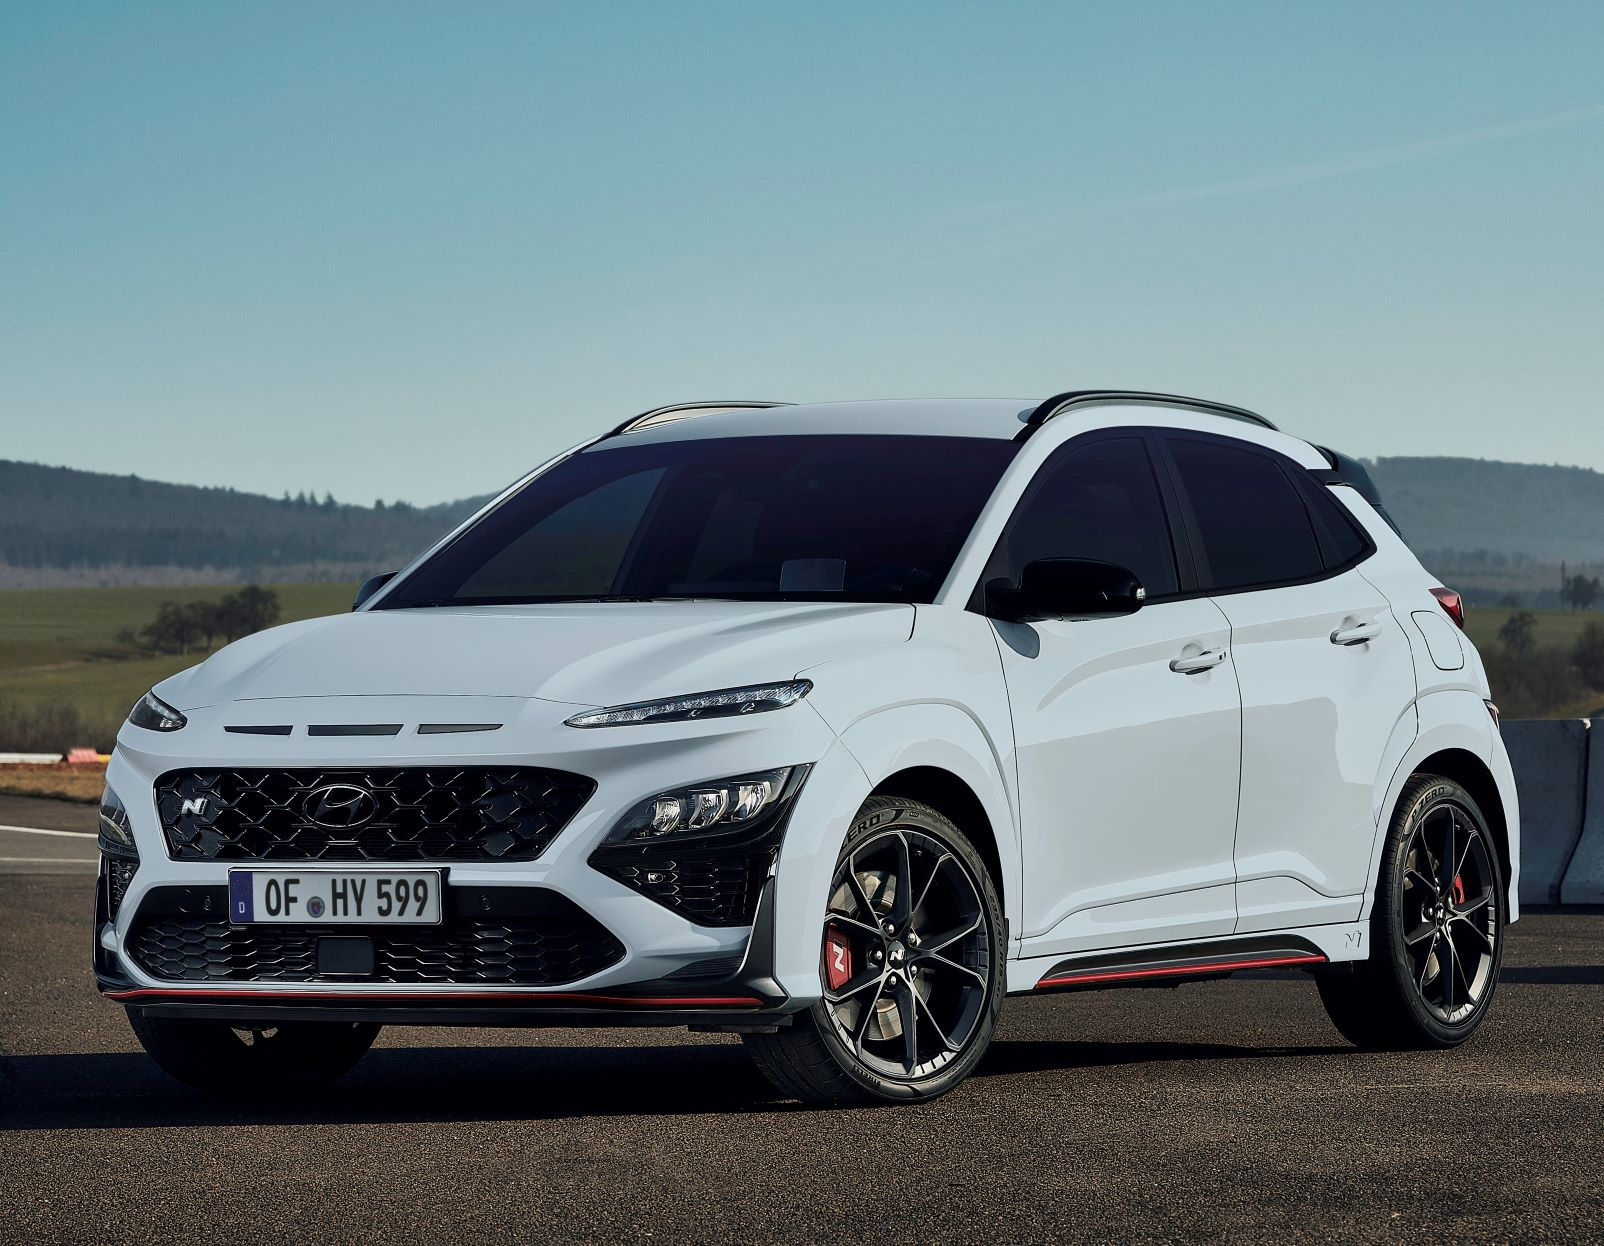 The New Pirelli P Zero Tyre For The All-New Hyundai Kona N